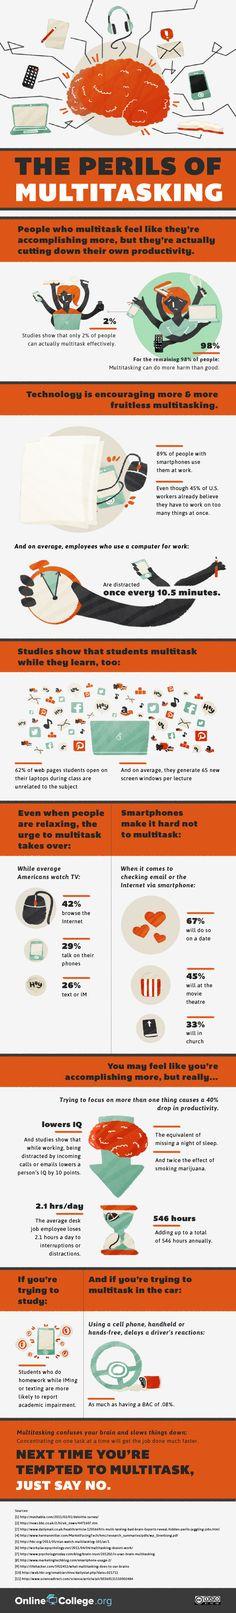 Multitasking Is Making You Dumb [Infographic]